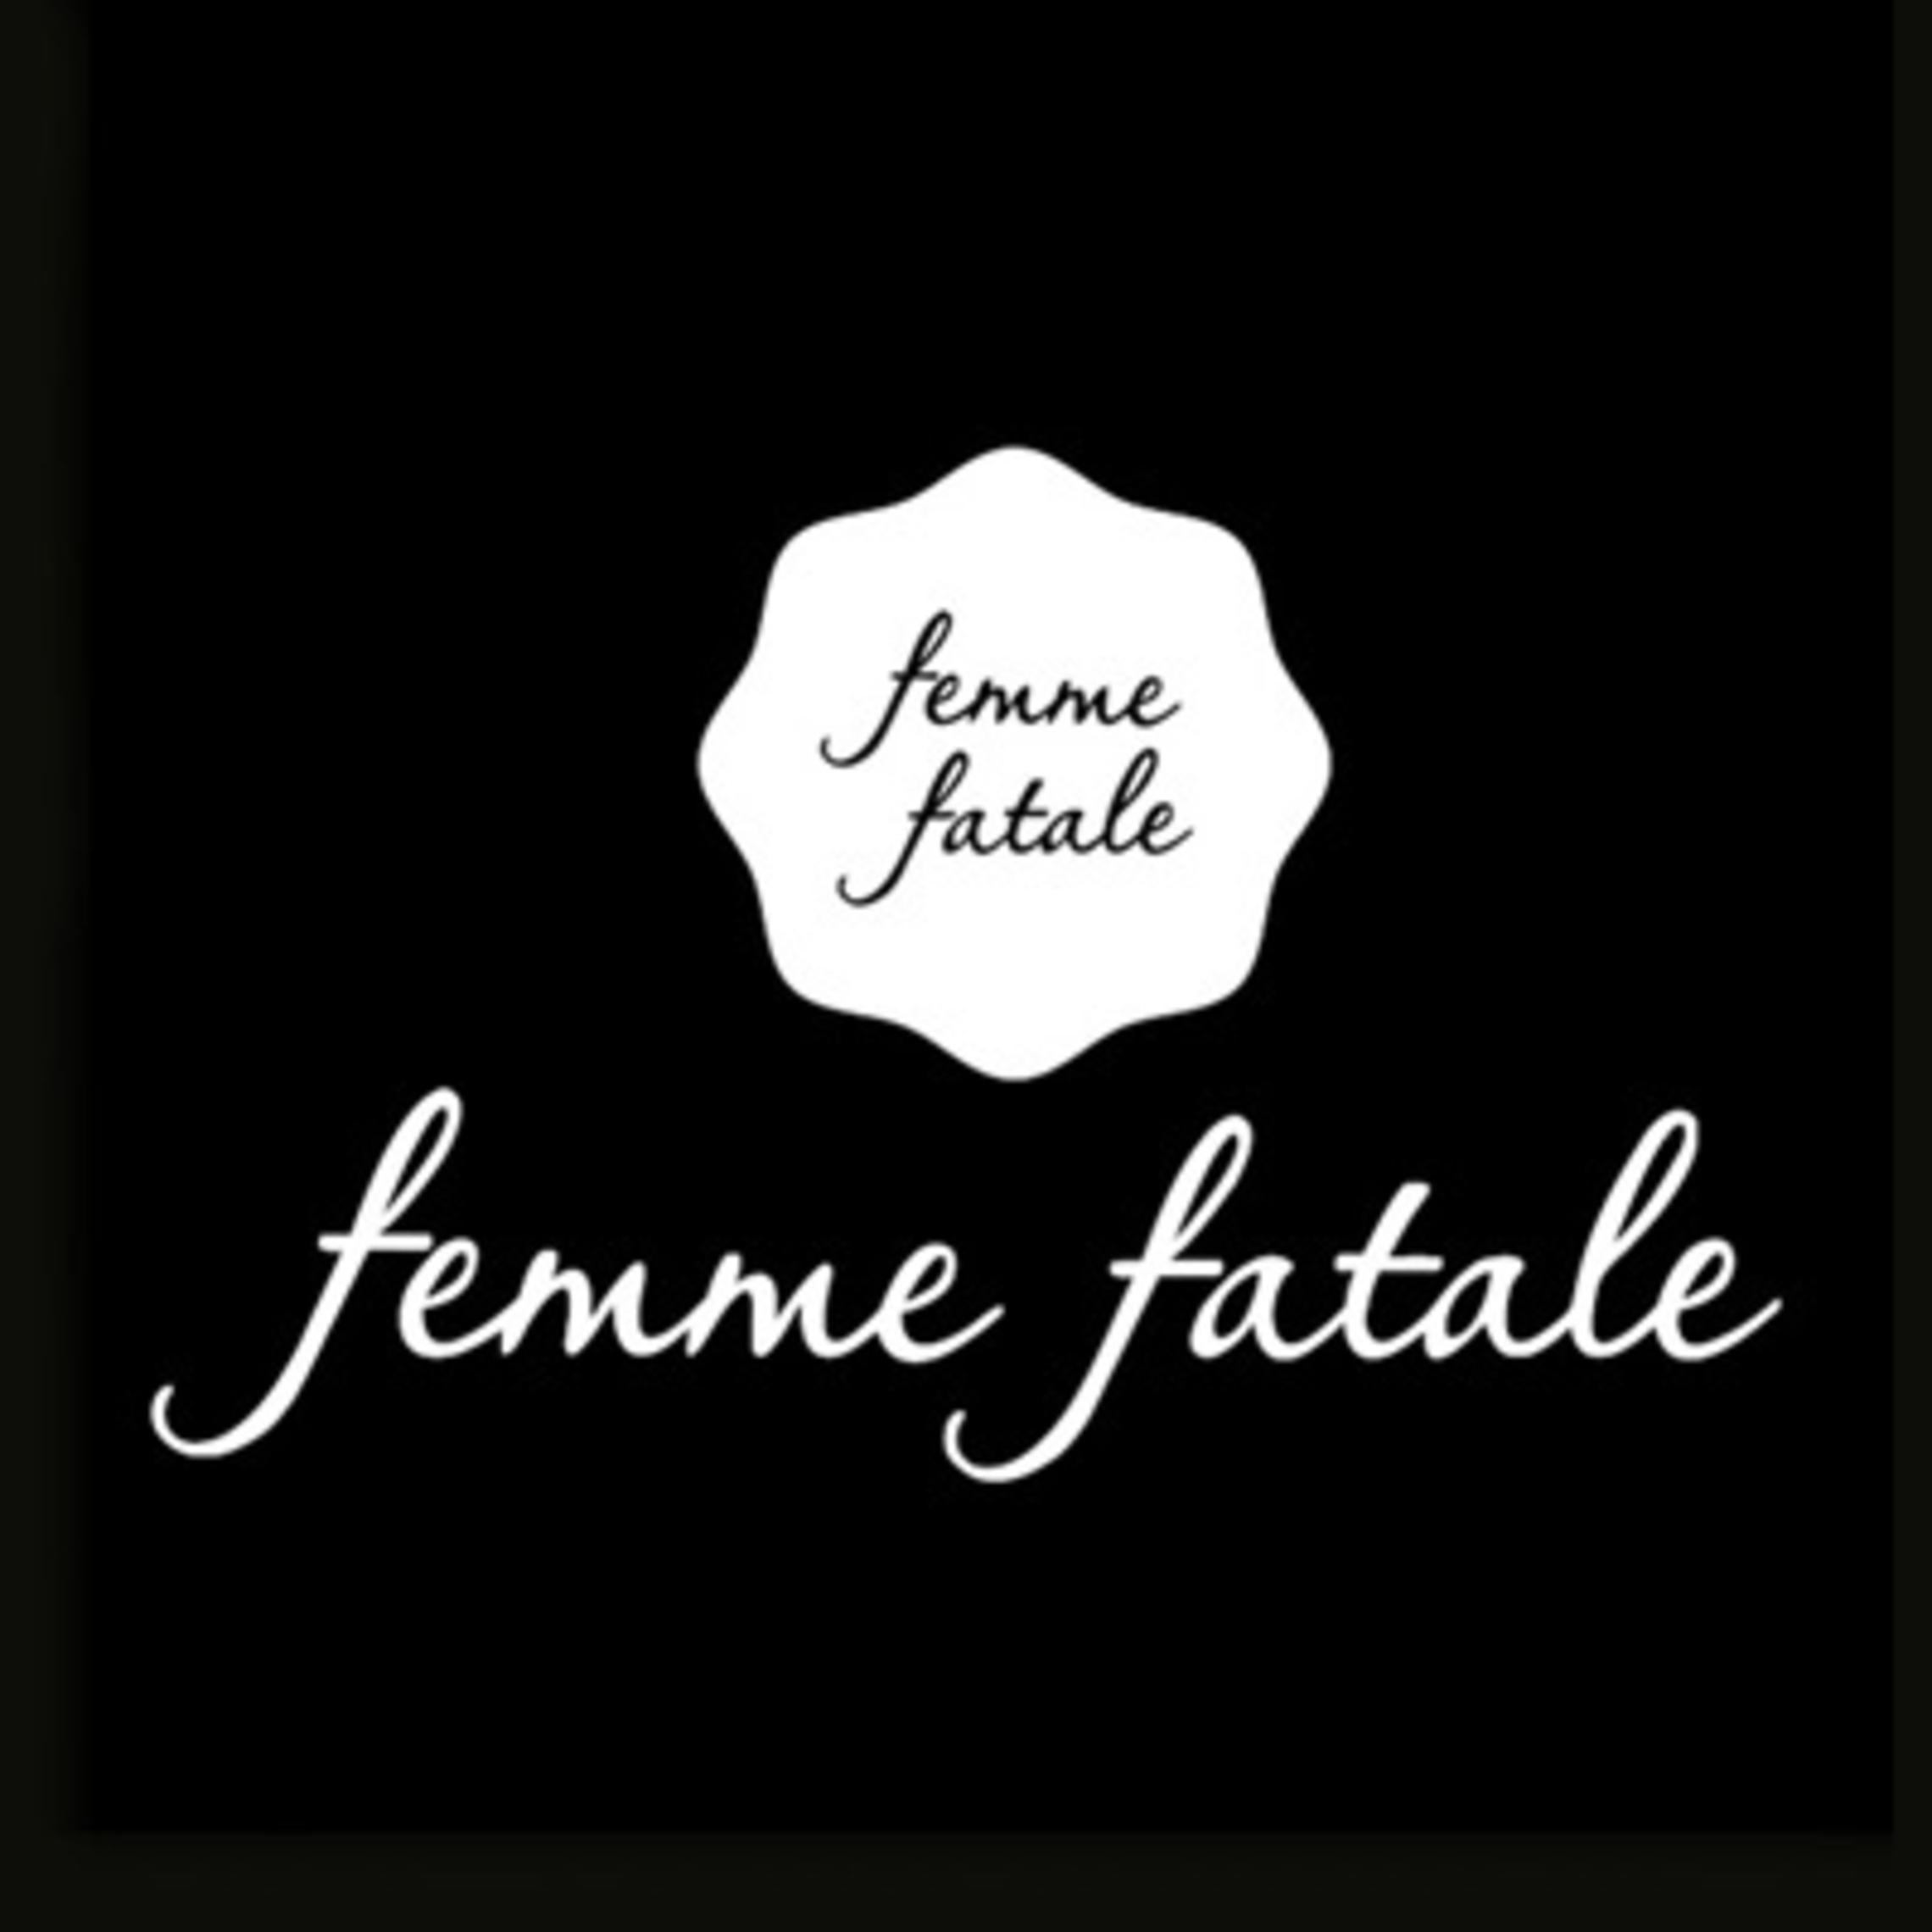 femme fatale 2- company logo